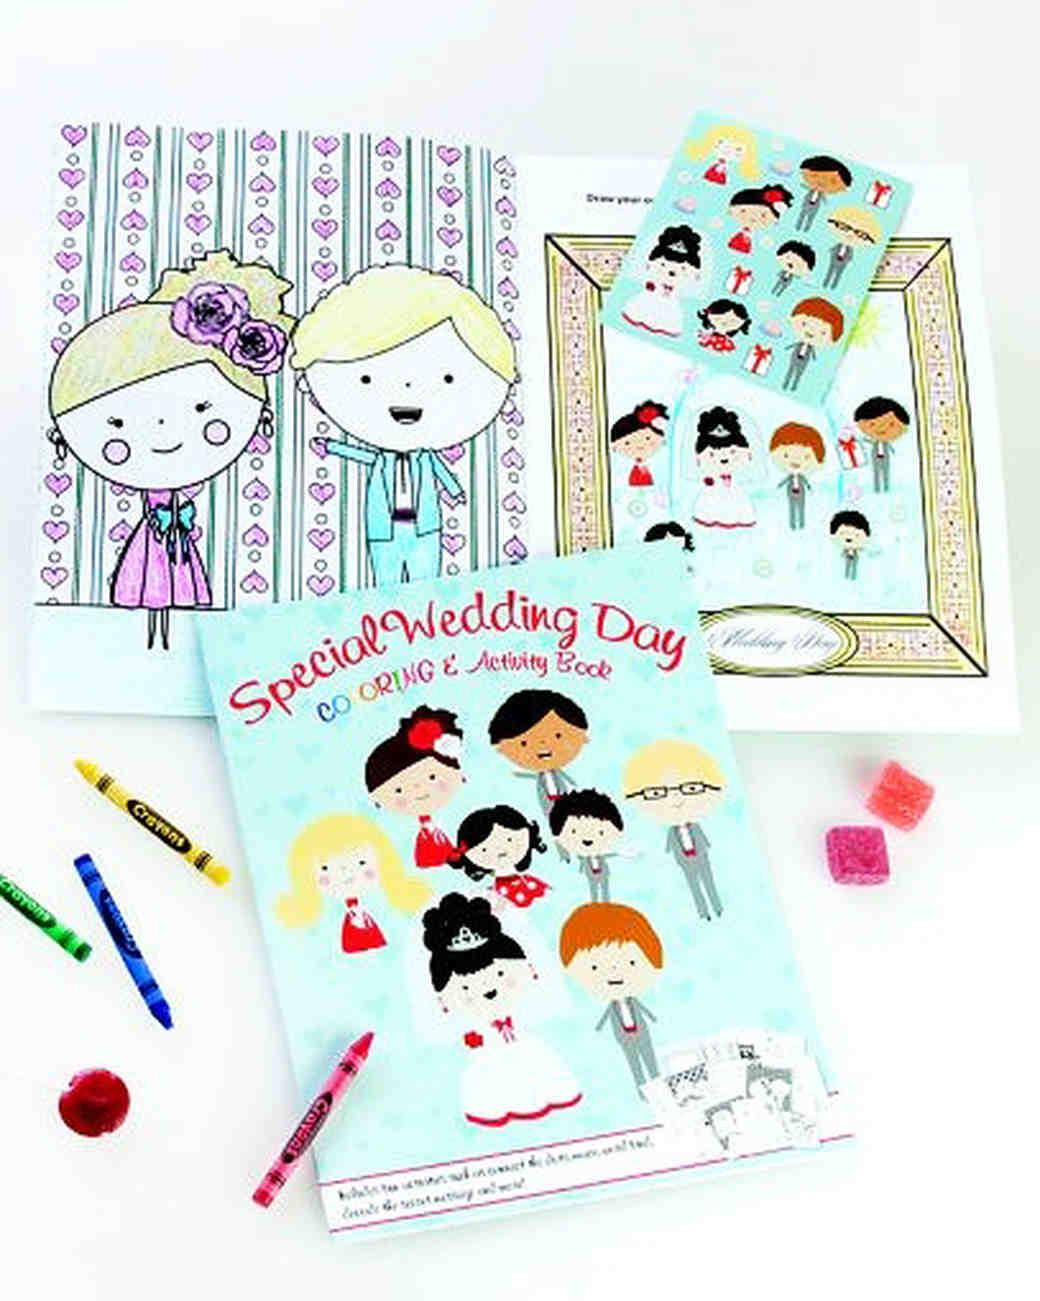 flower-girl-gift-wedding-coloring-book-0616.jpg